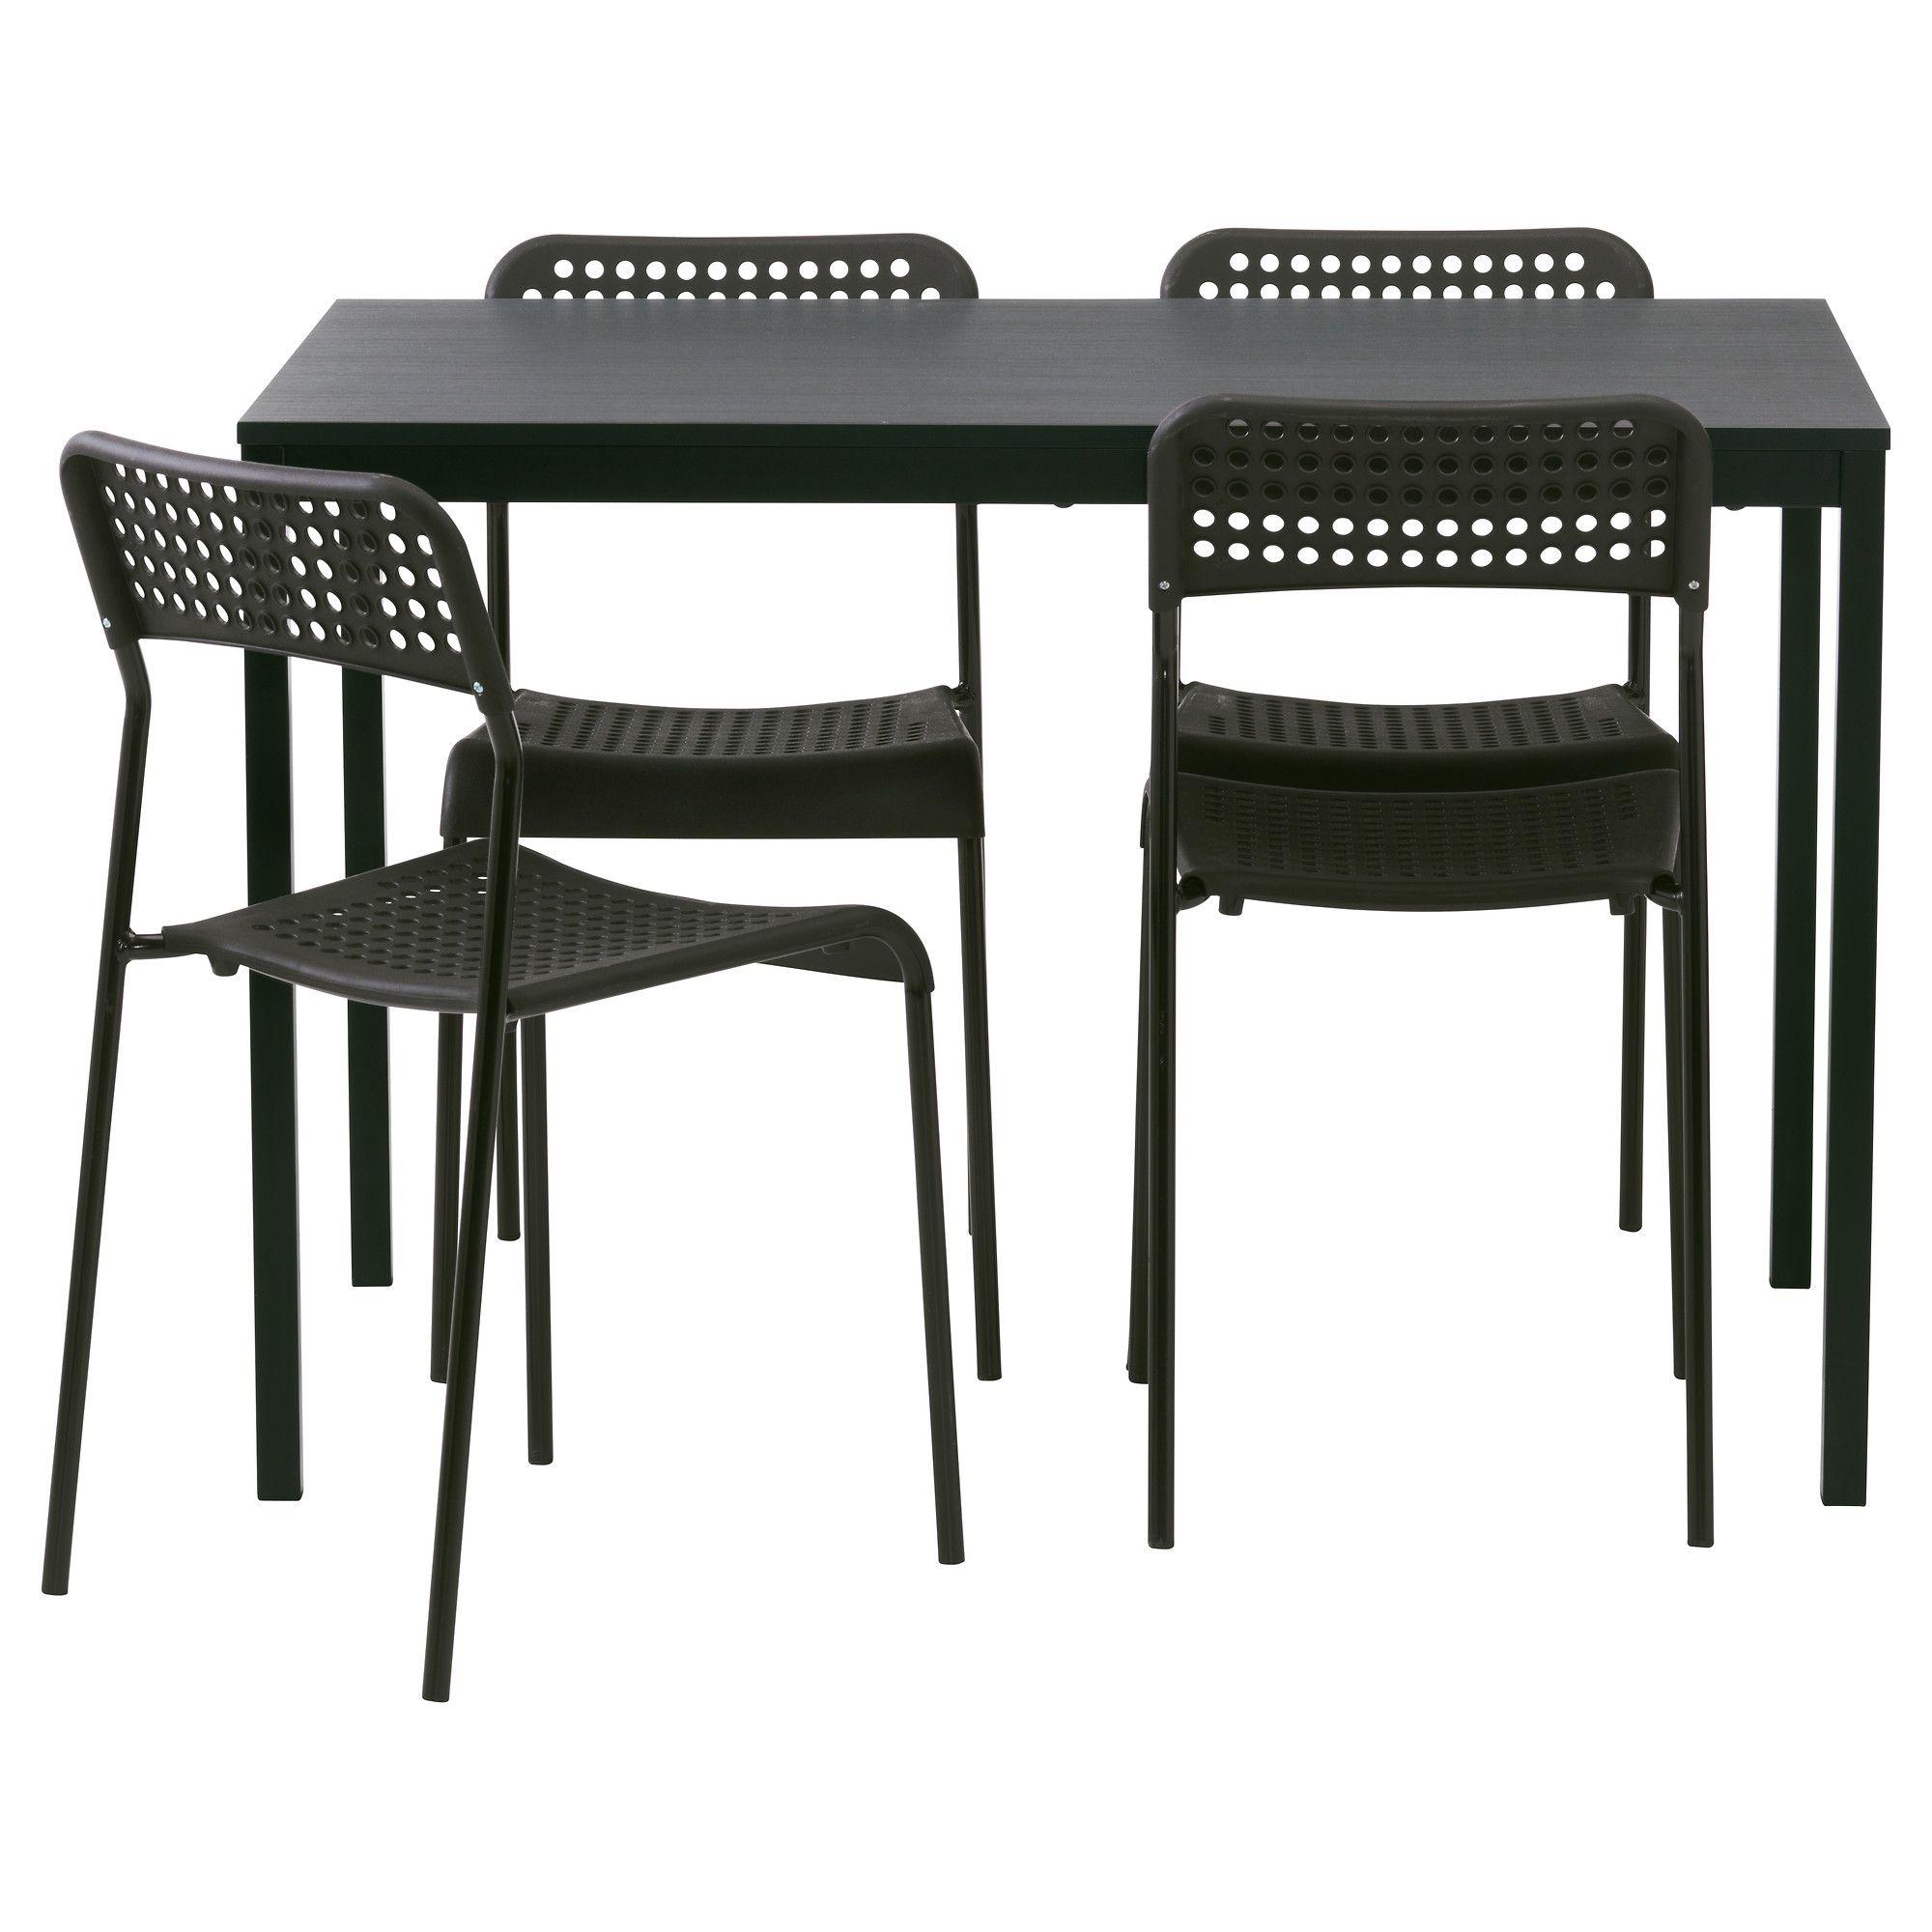 Tarendo Adde Table And 4 Chairs Black Ikea Ikea Table And Chairs Ikea Dining Sets Ikea Dining